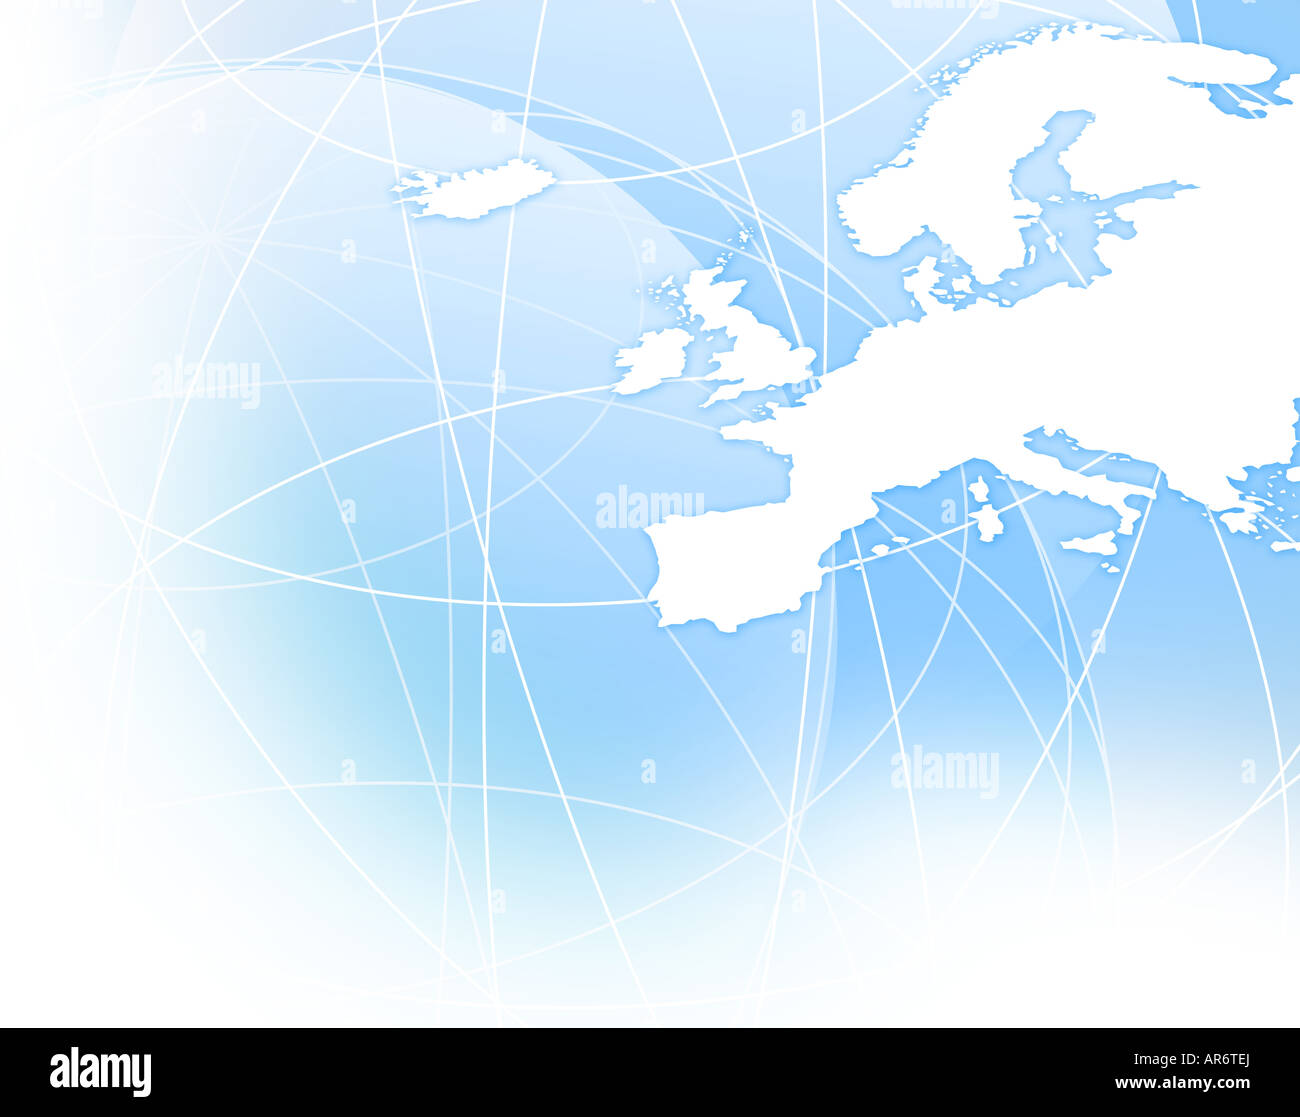 Map of Europe digital illustration - Stock Image